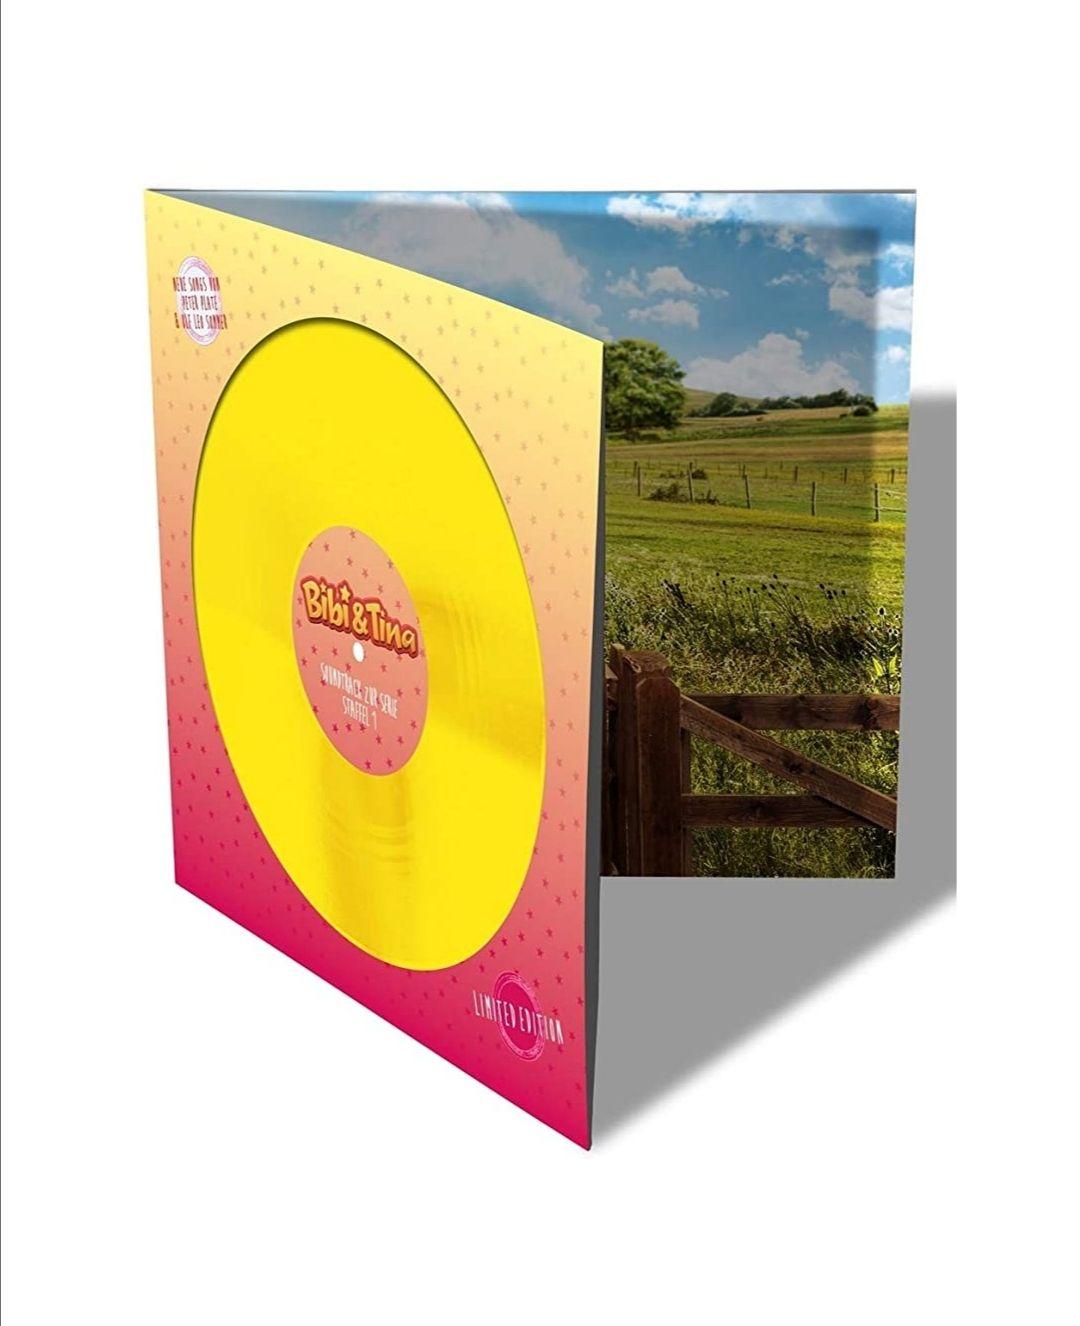 Prime - Vinyl, Bibi&Tina, LP, Soundtrack